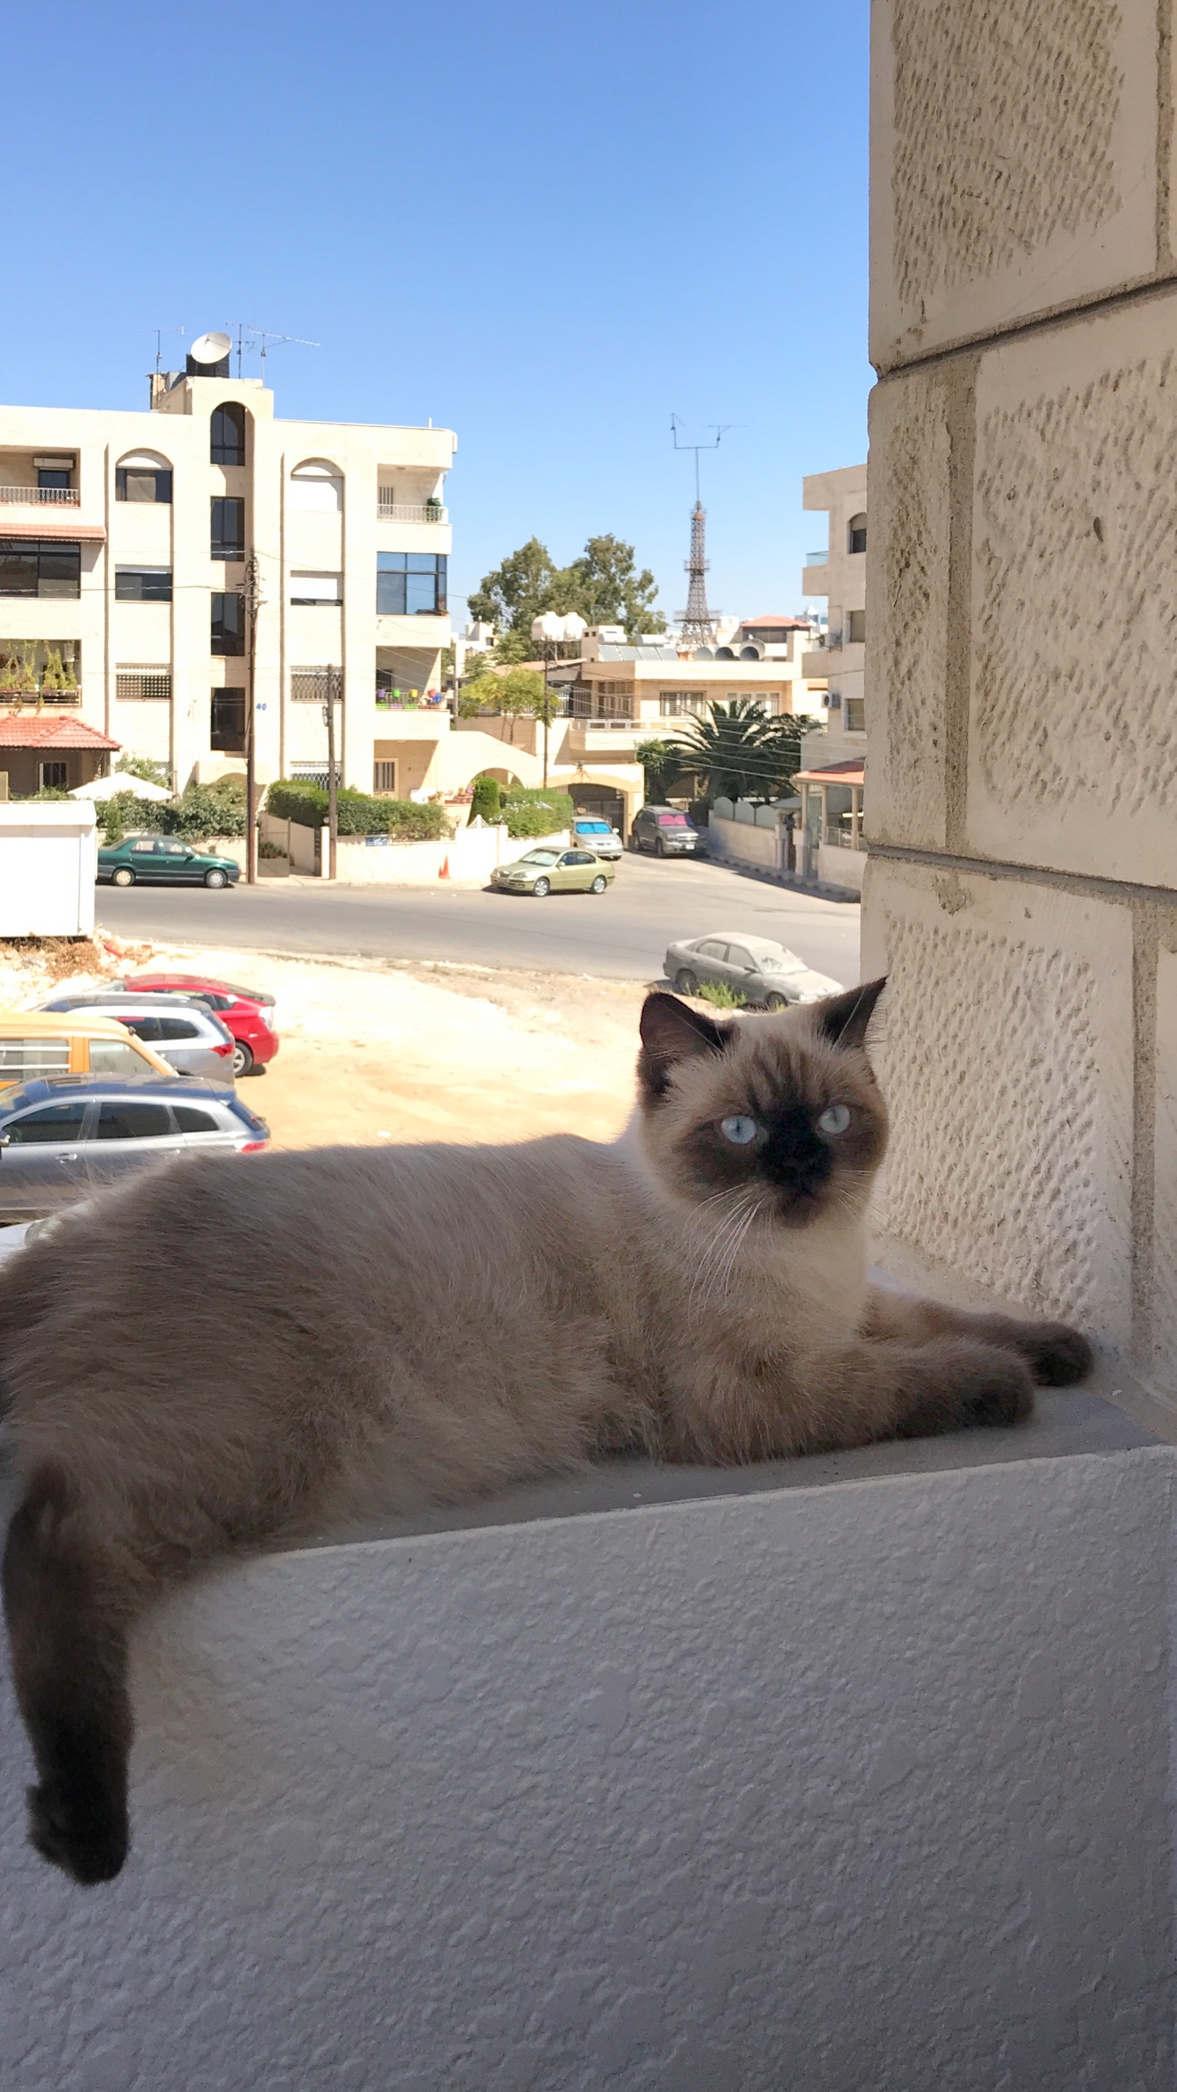 warsaw_travel_jordan_nowe_miejsca_3632_02_10_2019